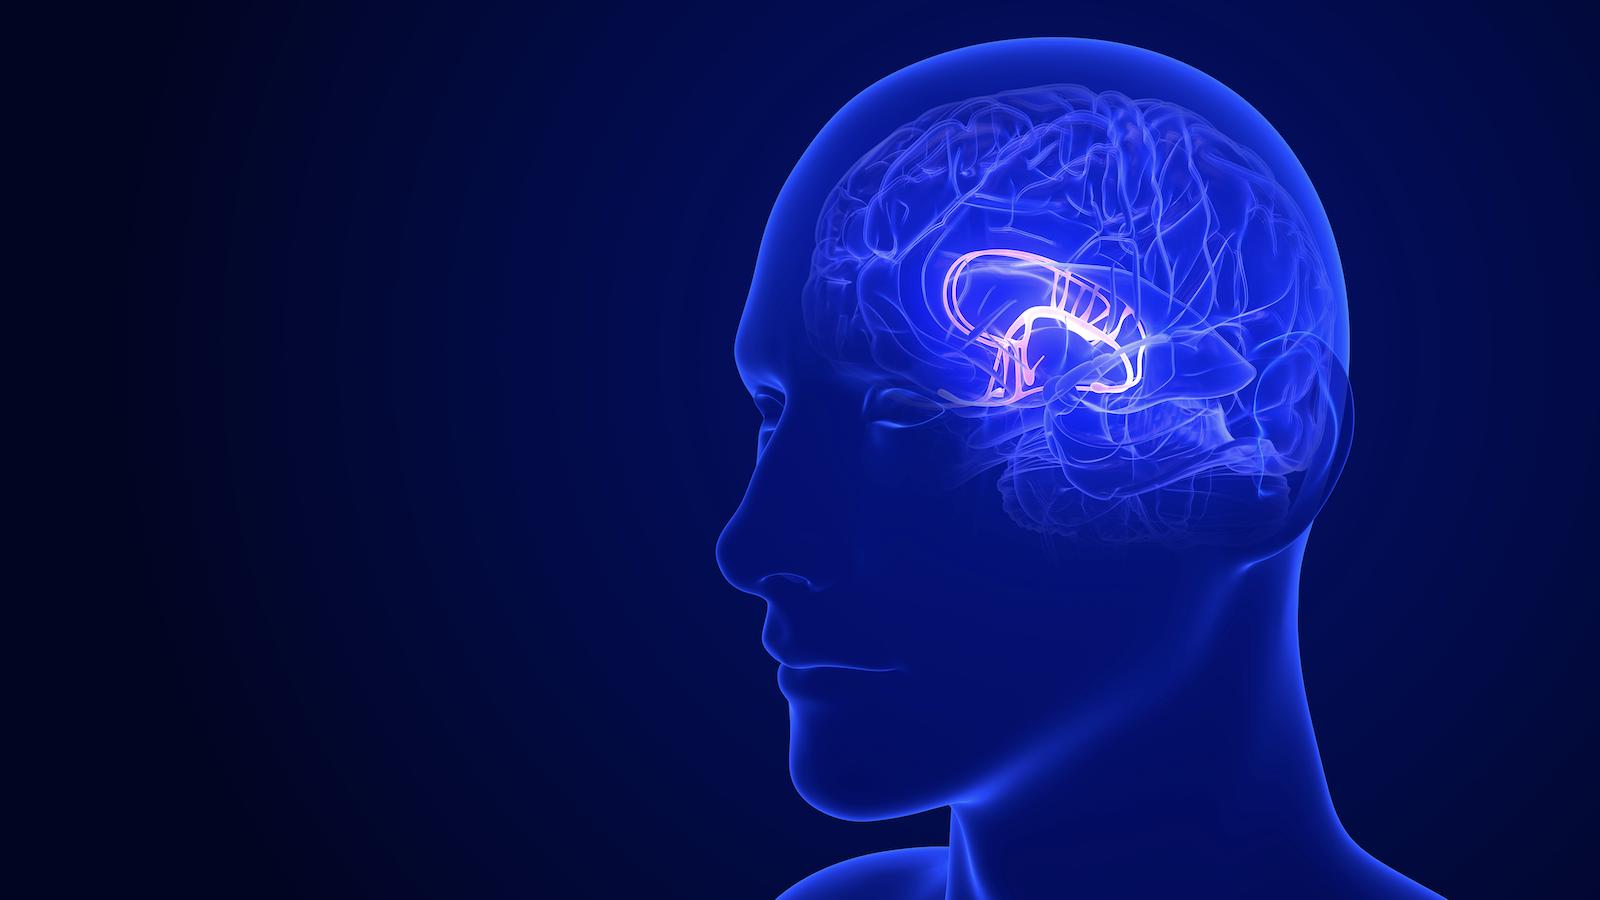 neuroplasticity training: illustration of the limbic system